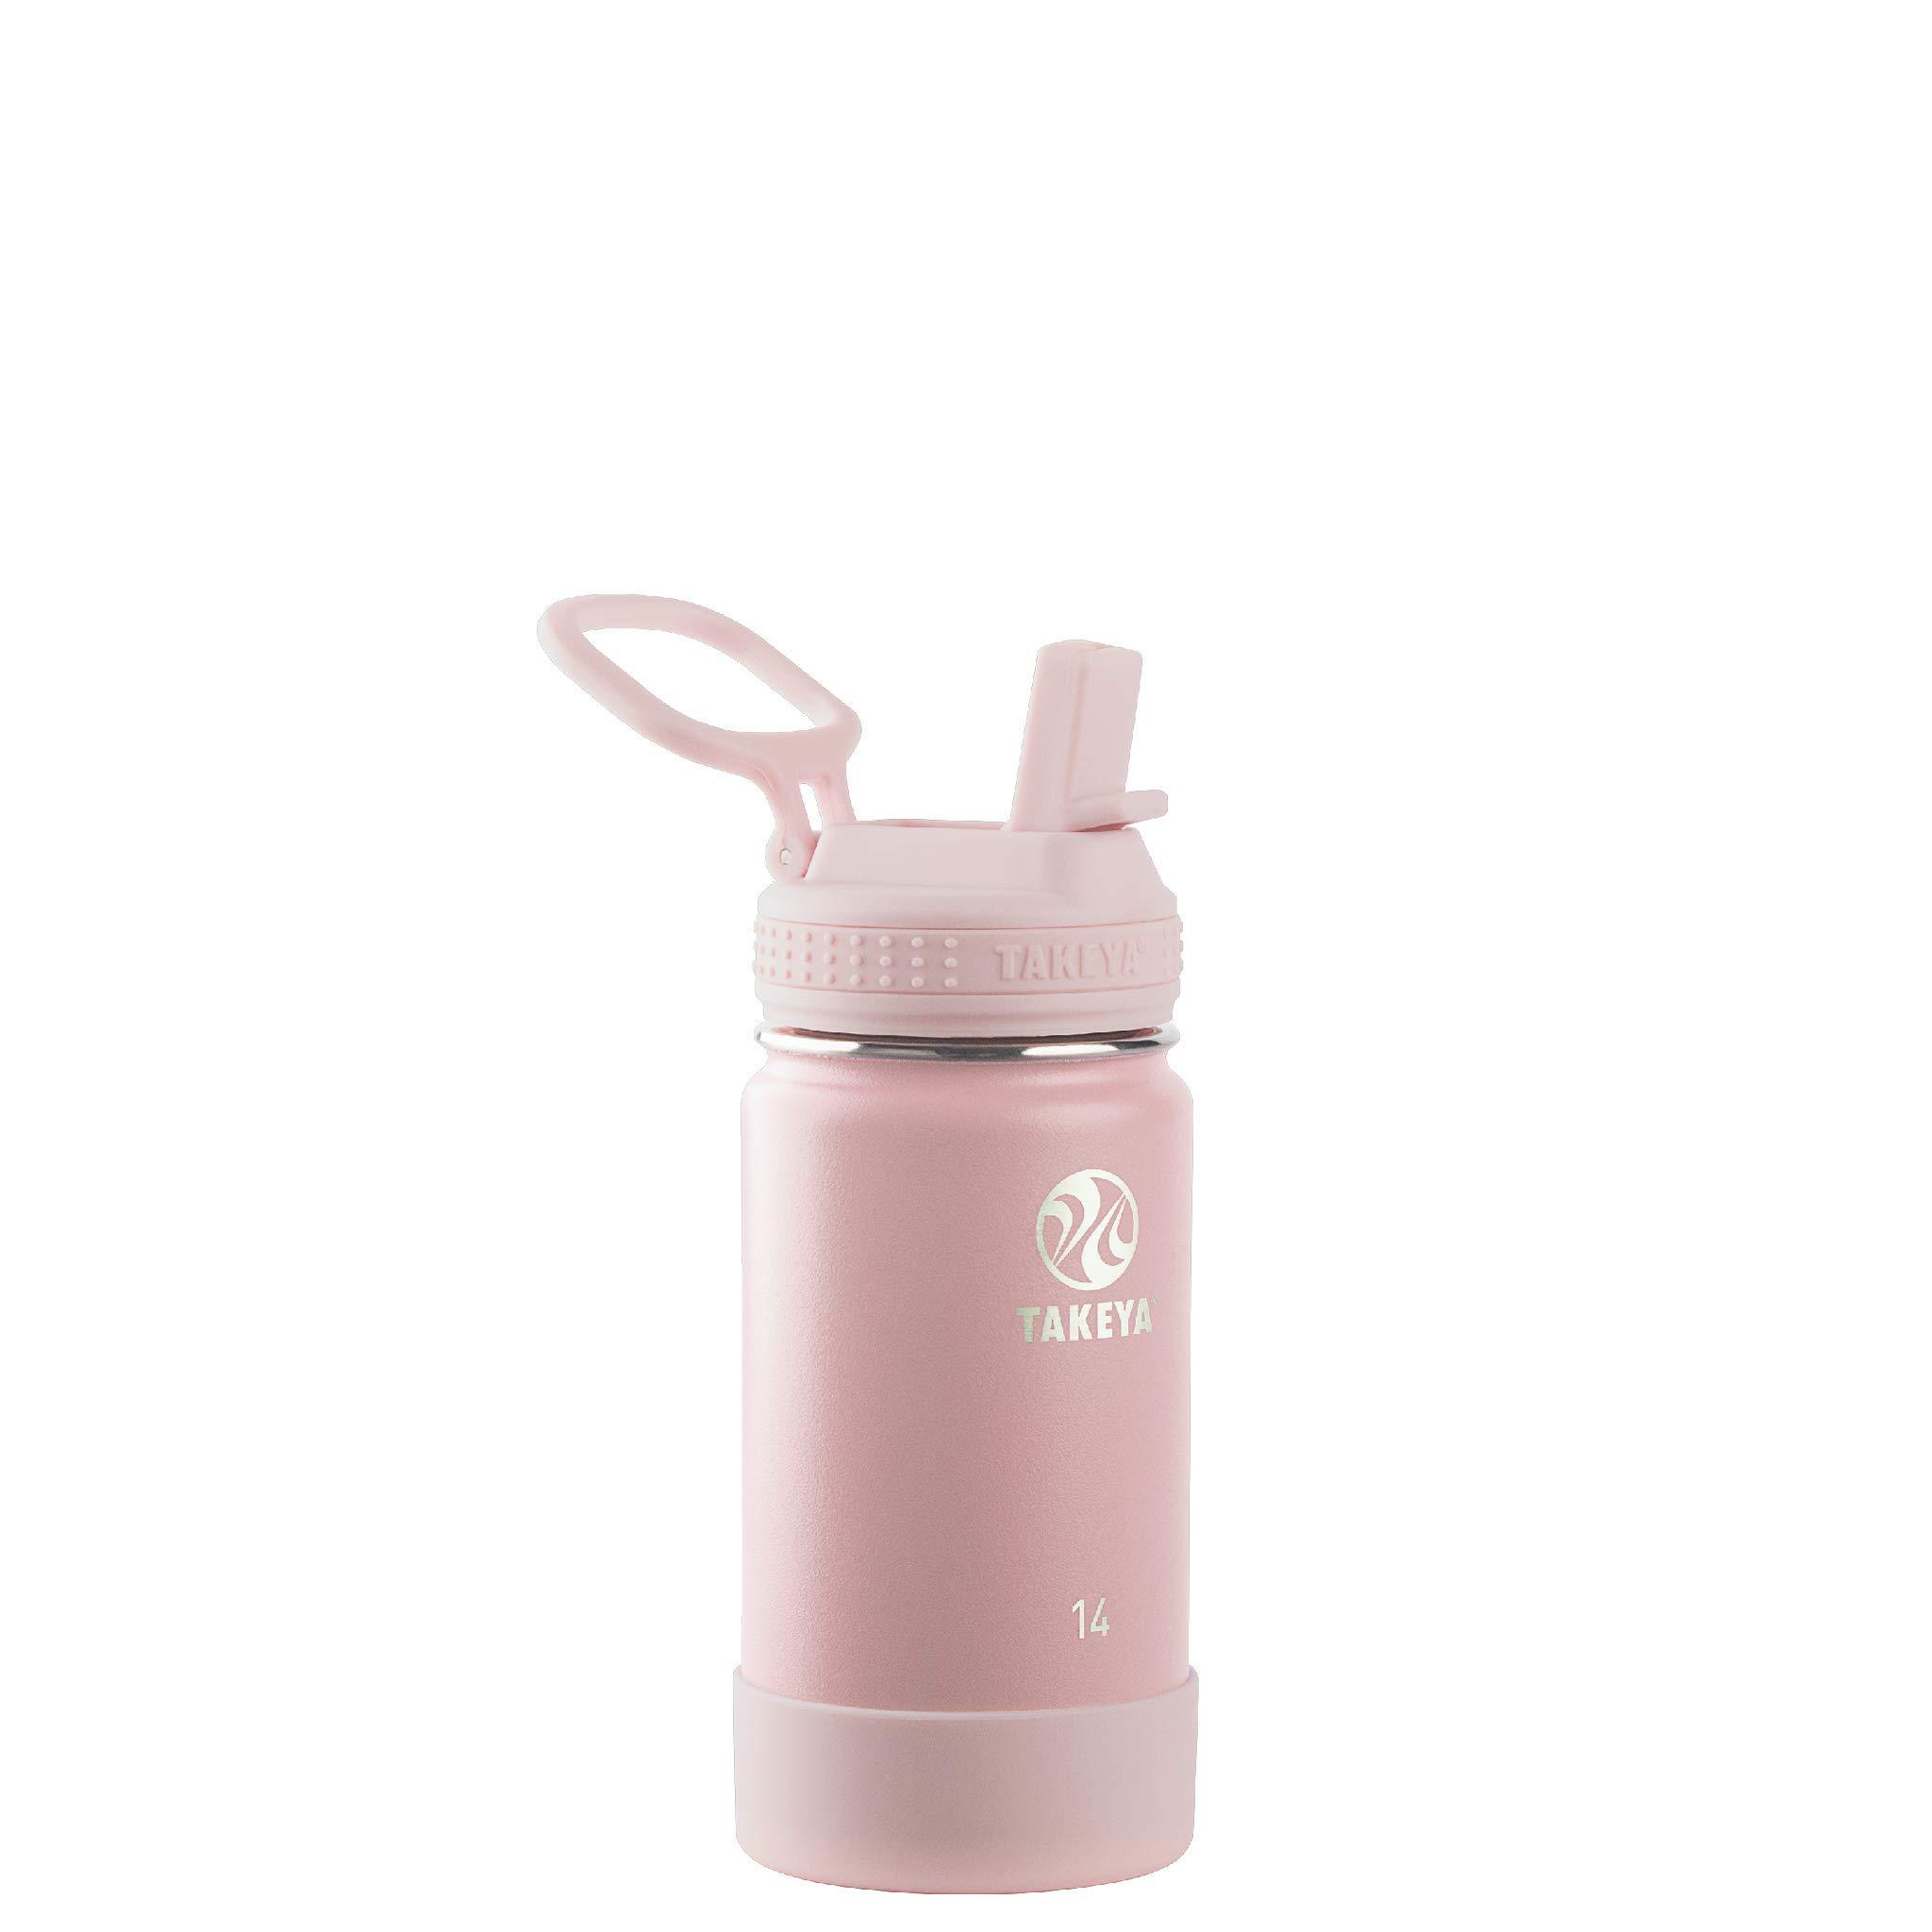 Takeya Kids Insulated Water Bottle w/Straw Lid, 14 Ounce, Blush by Takeya